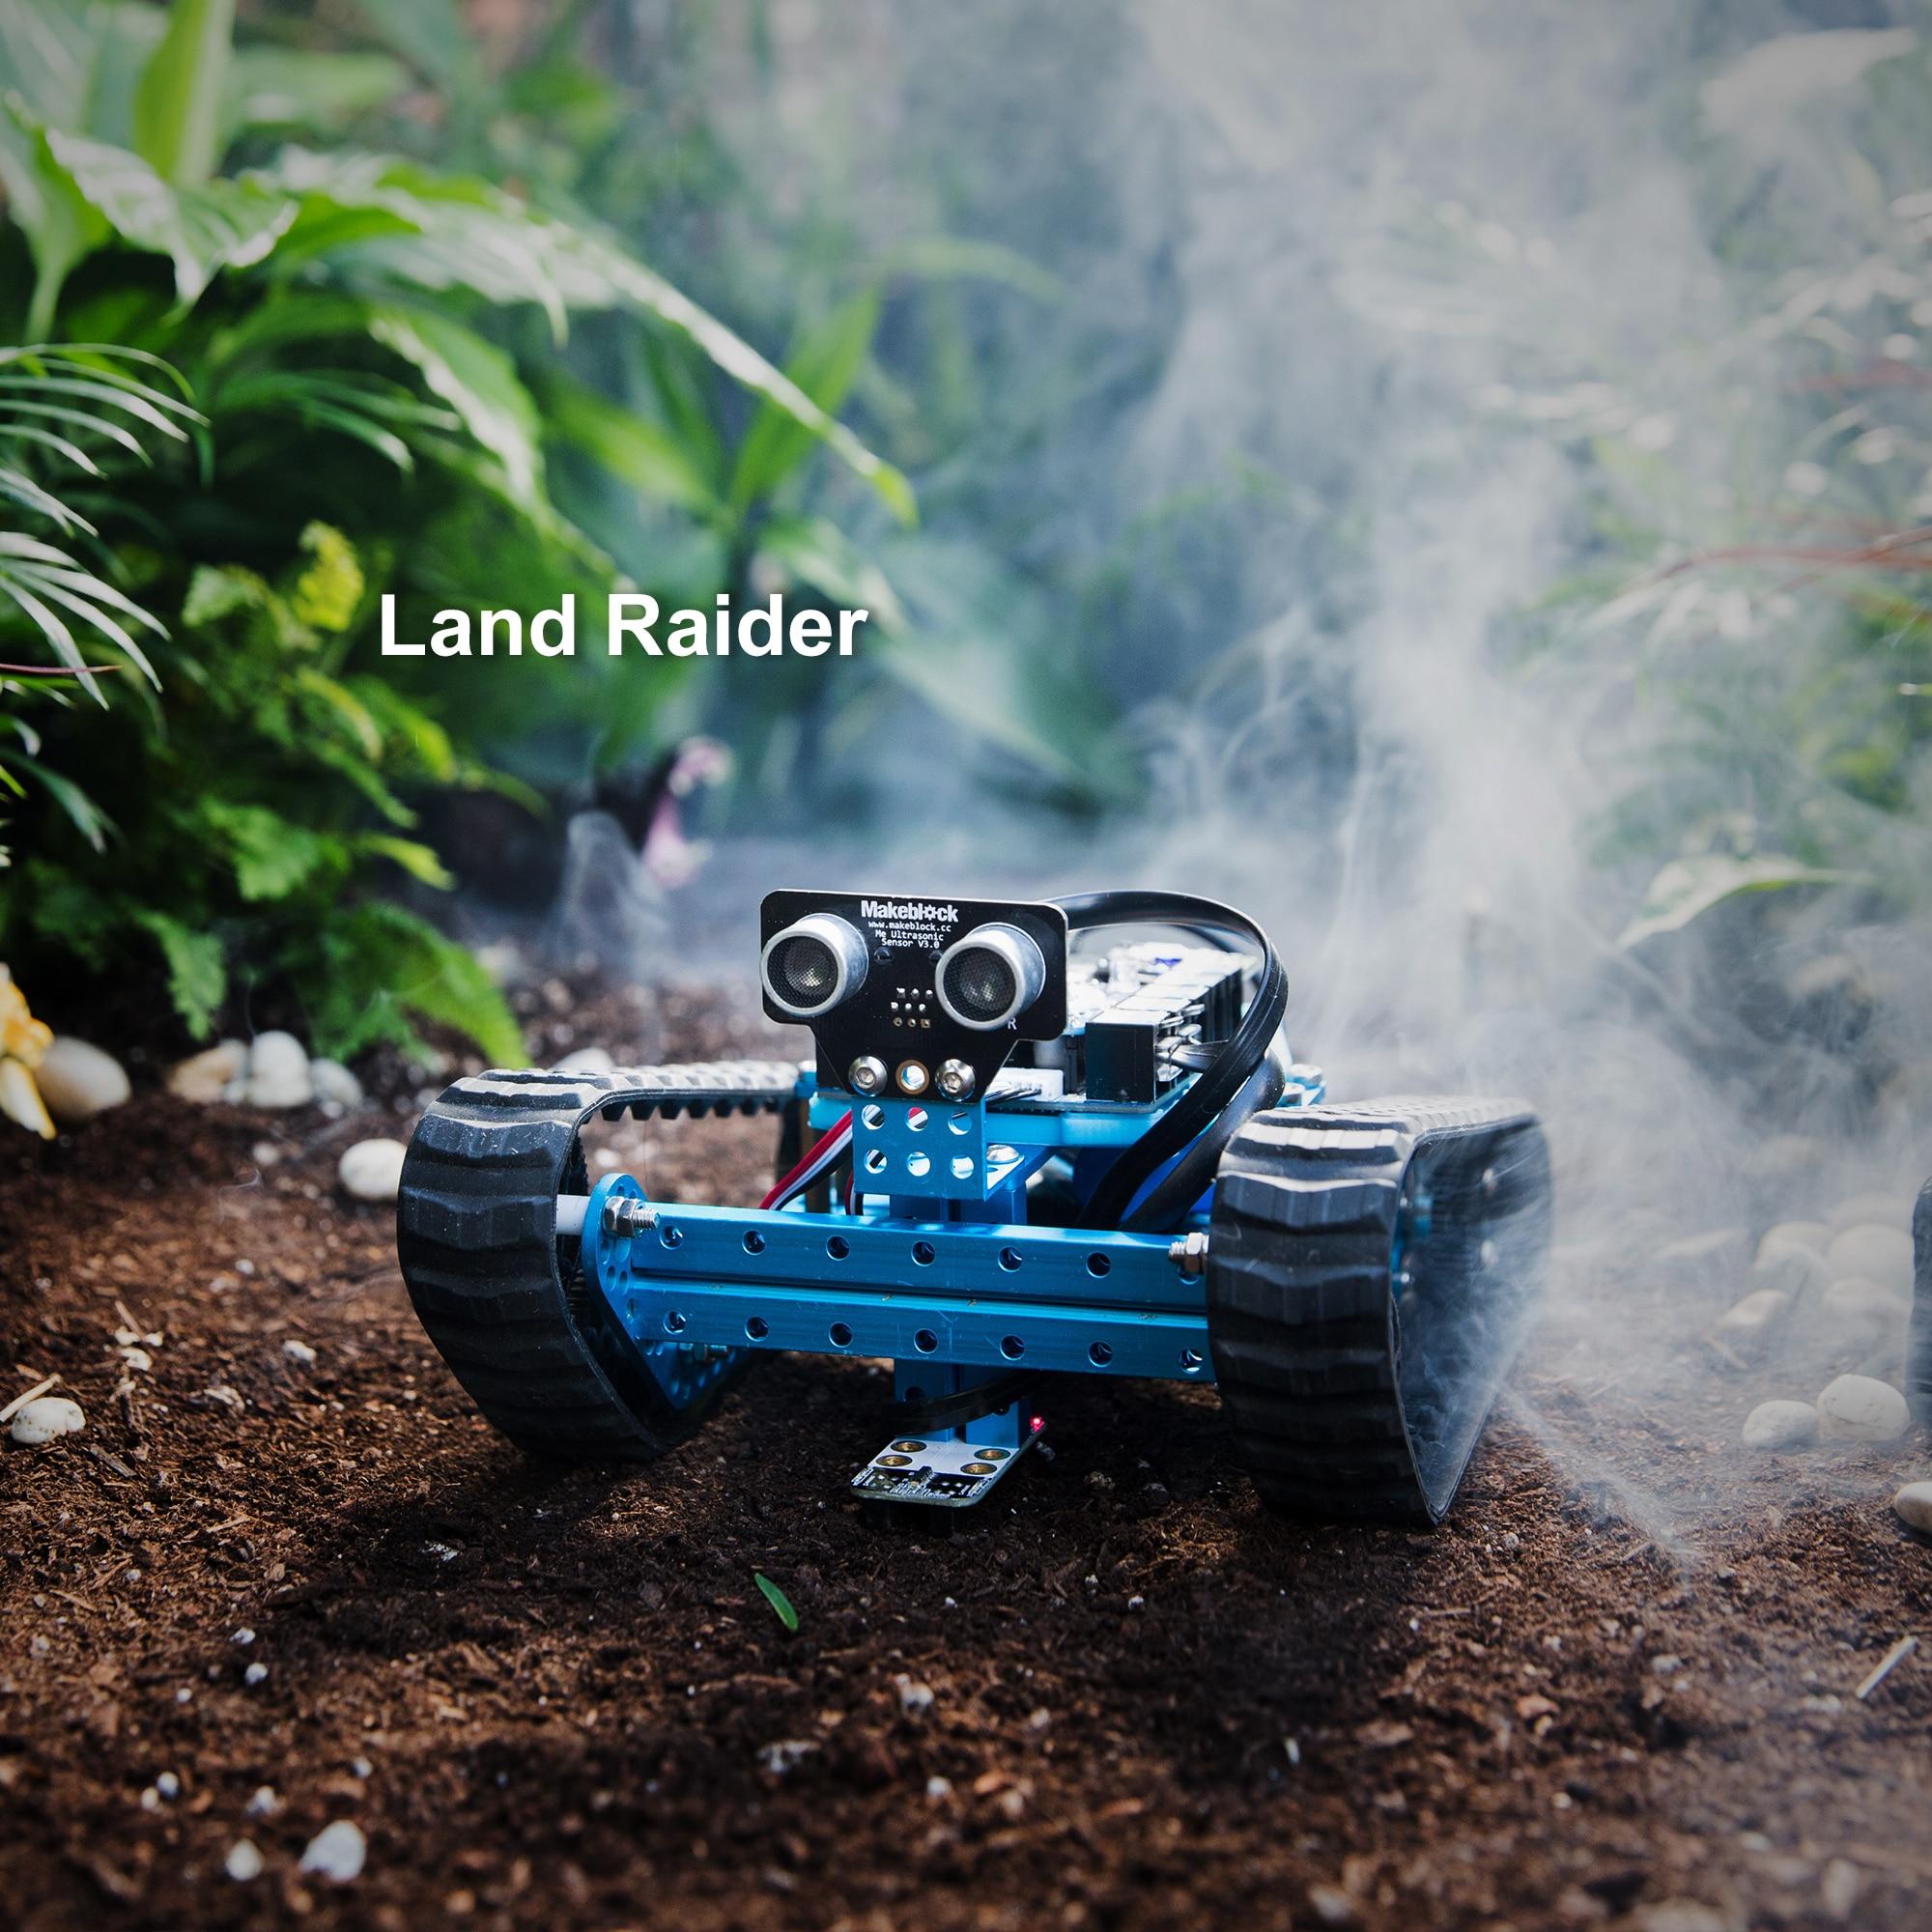 Makeblock Programmable mBot Ranger Robot Kit, Arduino,STEM Education, 3 in 1 Programmable Robotic for Kids, Age 12+ 2